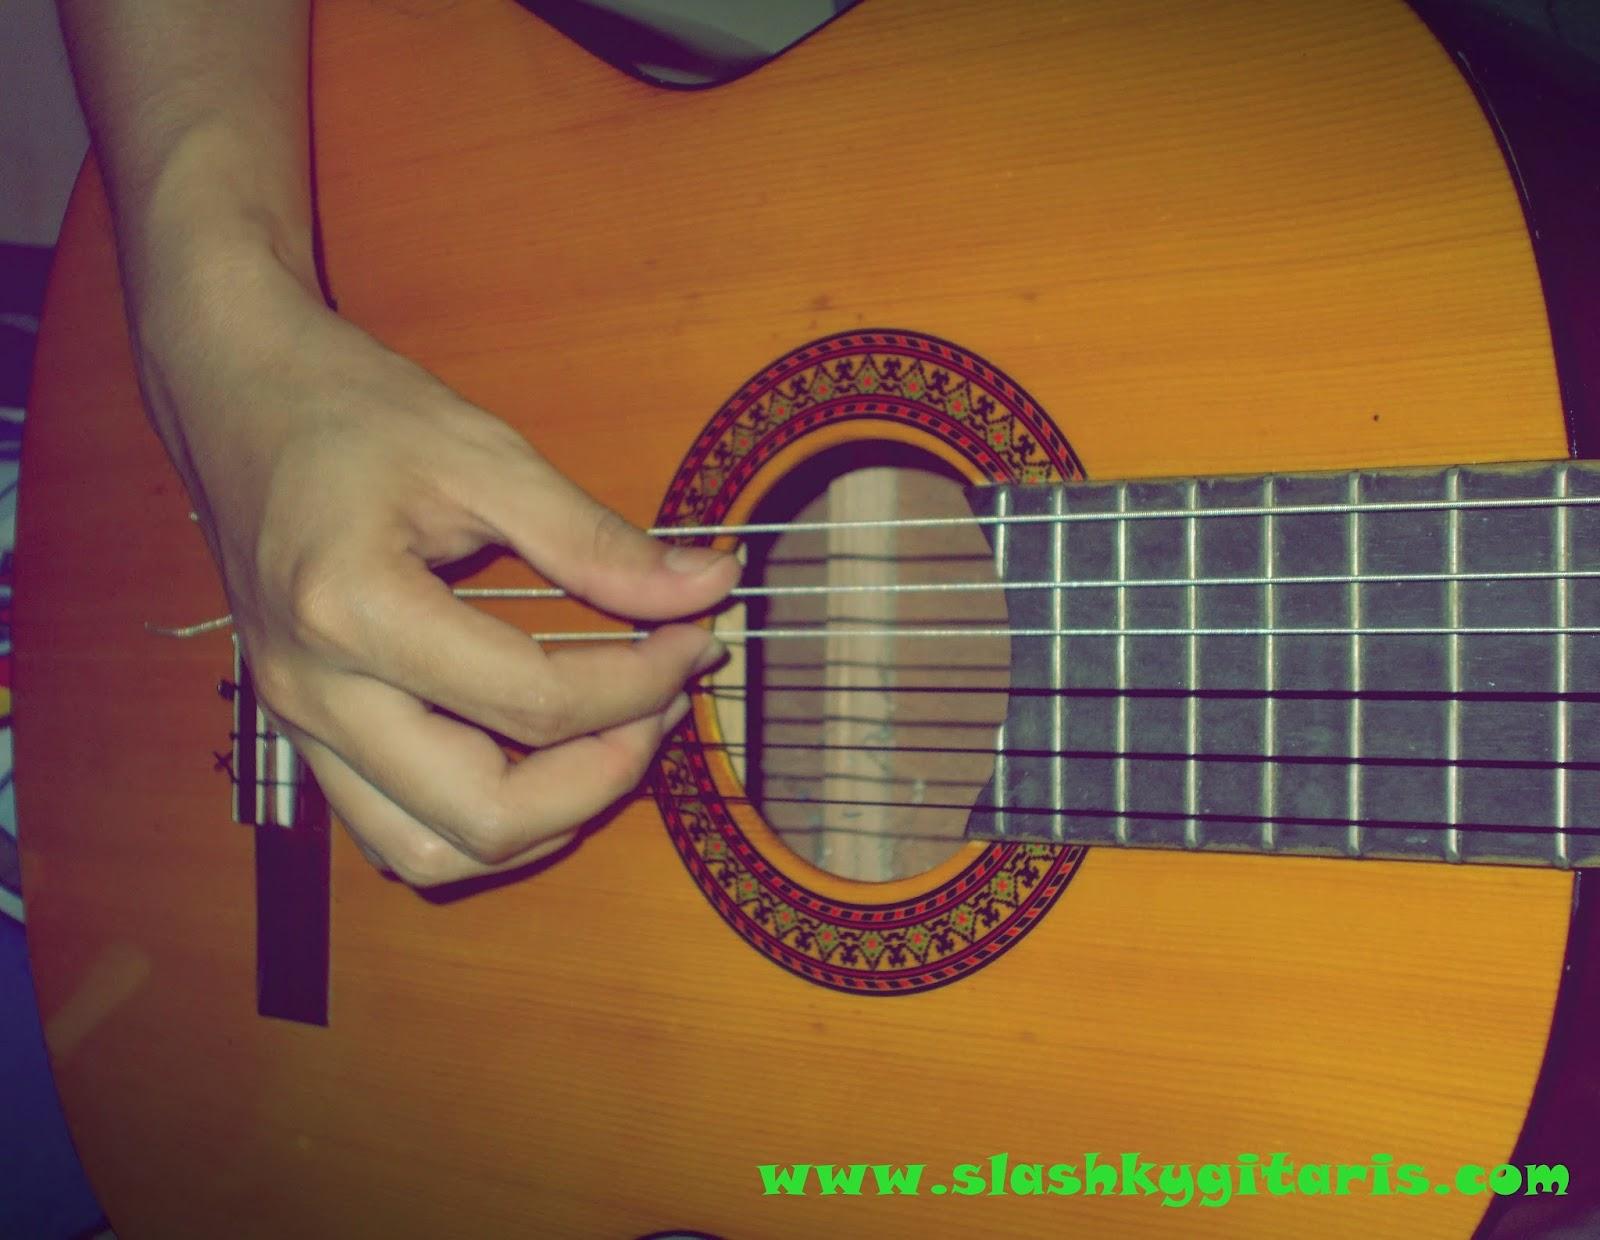 belajar cepat gitar, belajar gitar, belajar gitar akustik, chord dasar, chord major, chord minor, otodidak gitar, rahasia gitar, teknik belajar gitar, teknik gitar, tips bermain gitar,